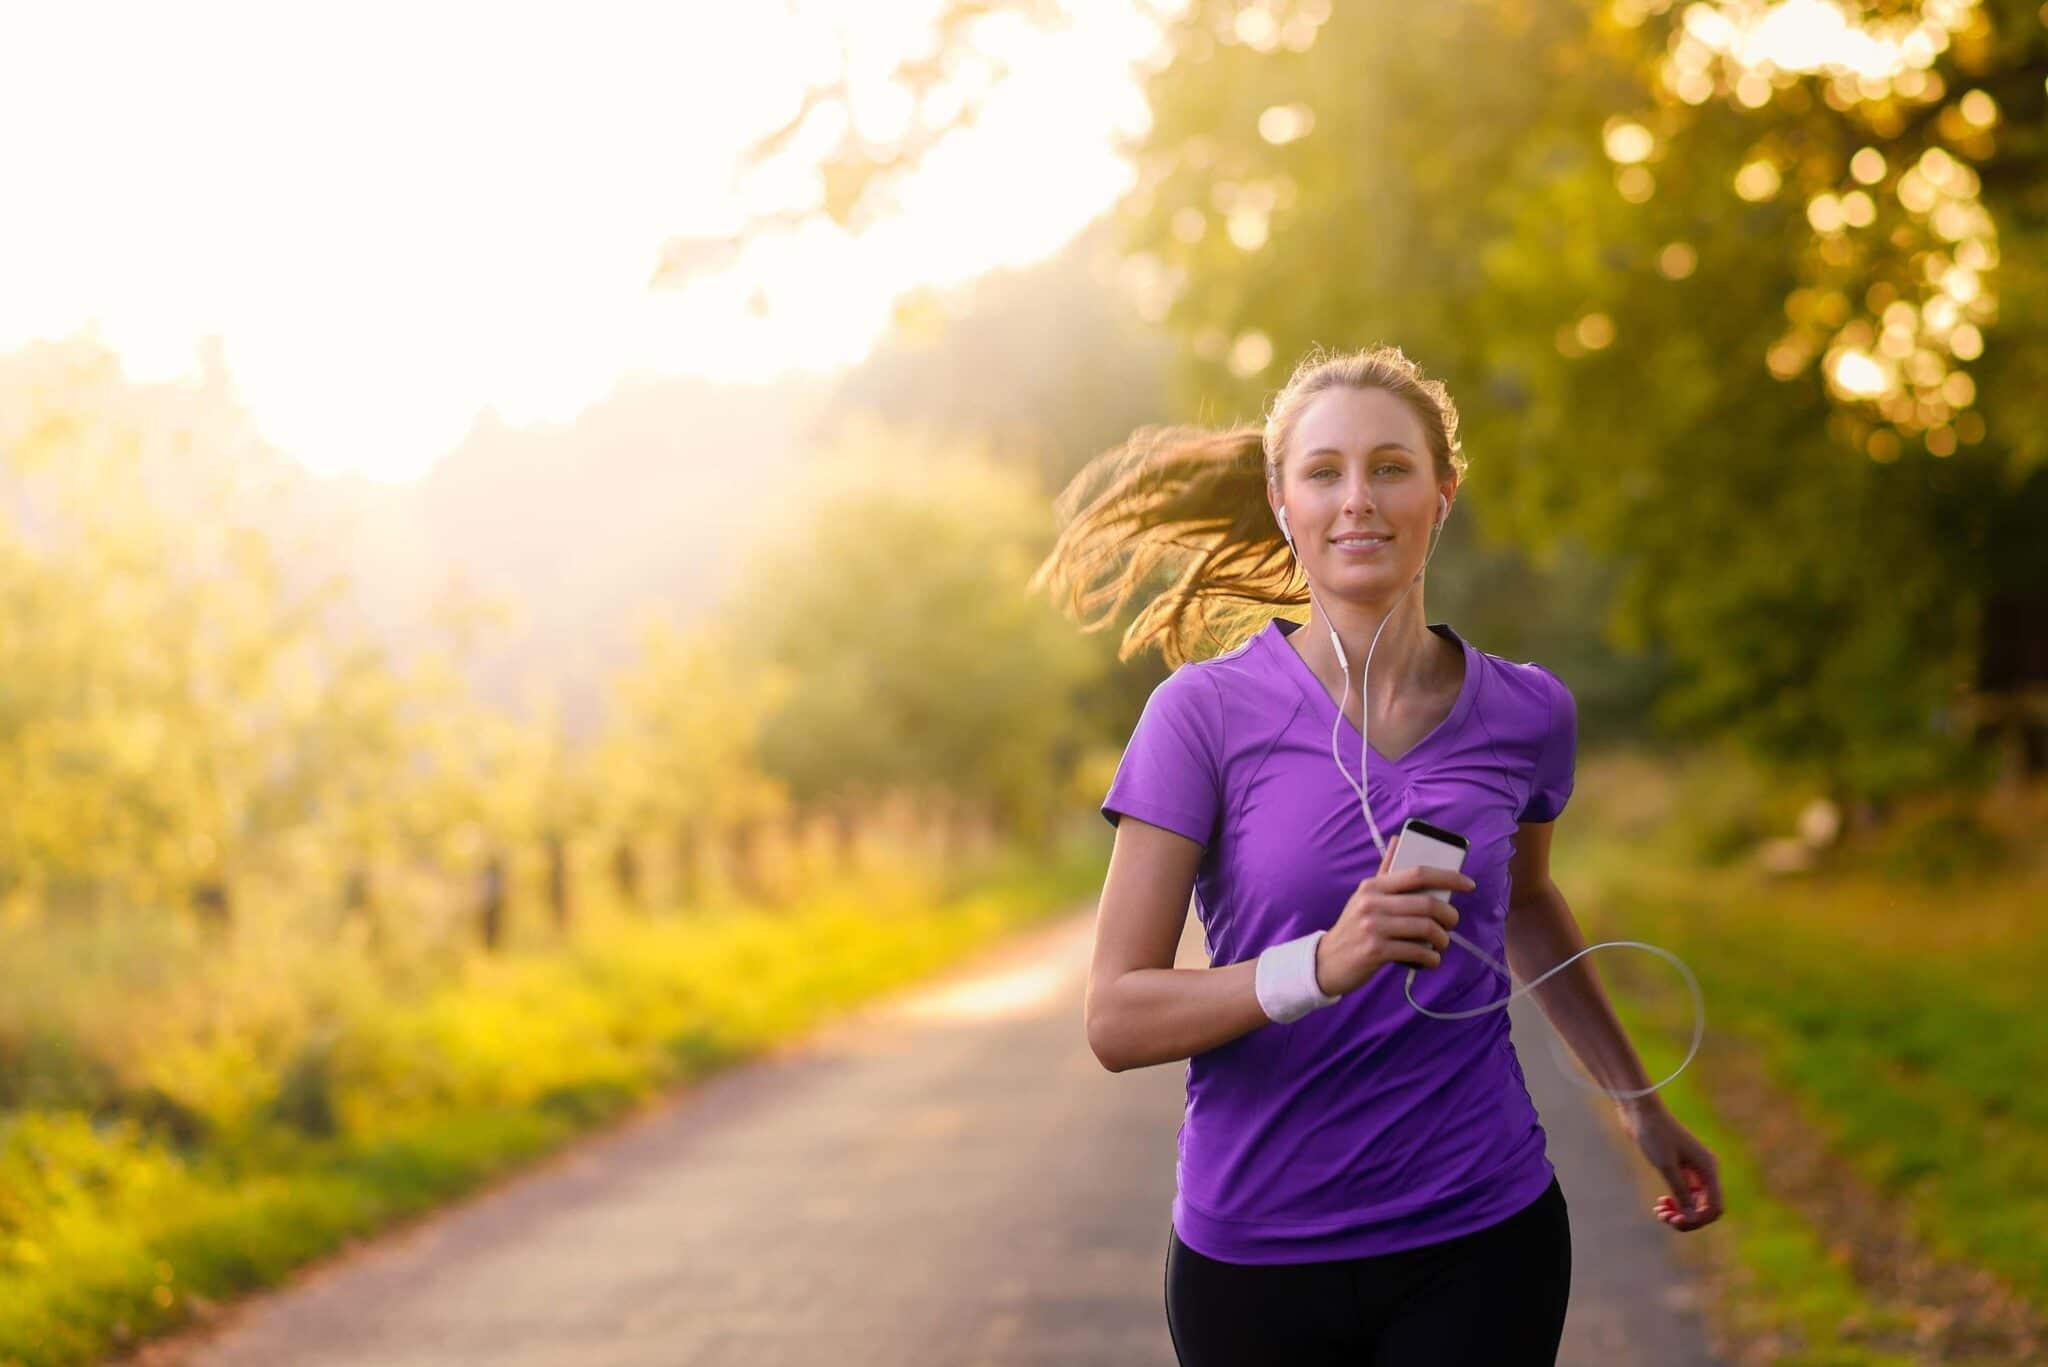 woman runs in sunlight